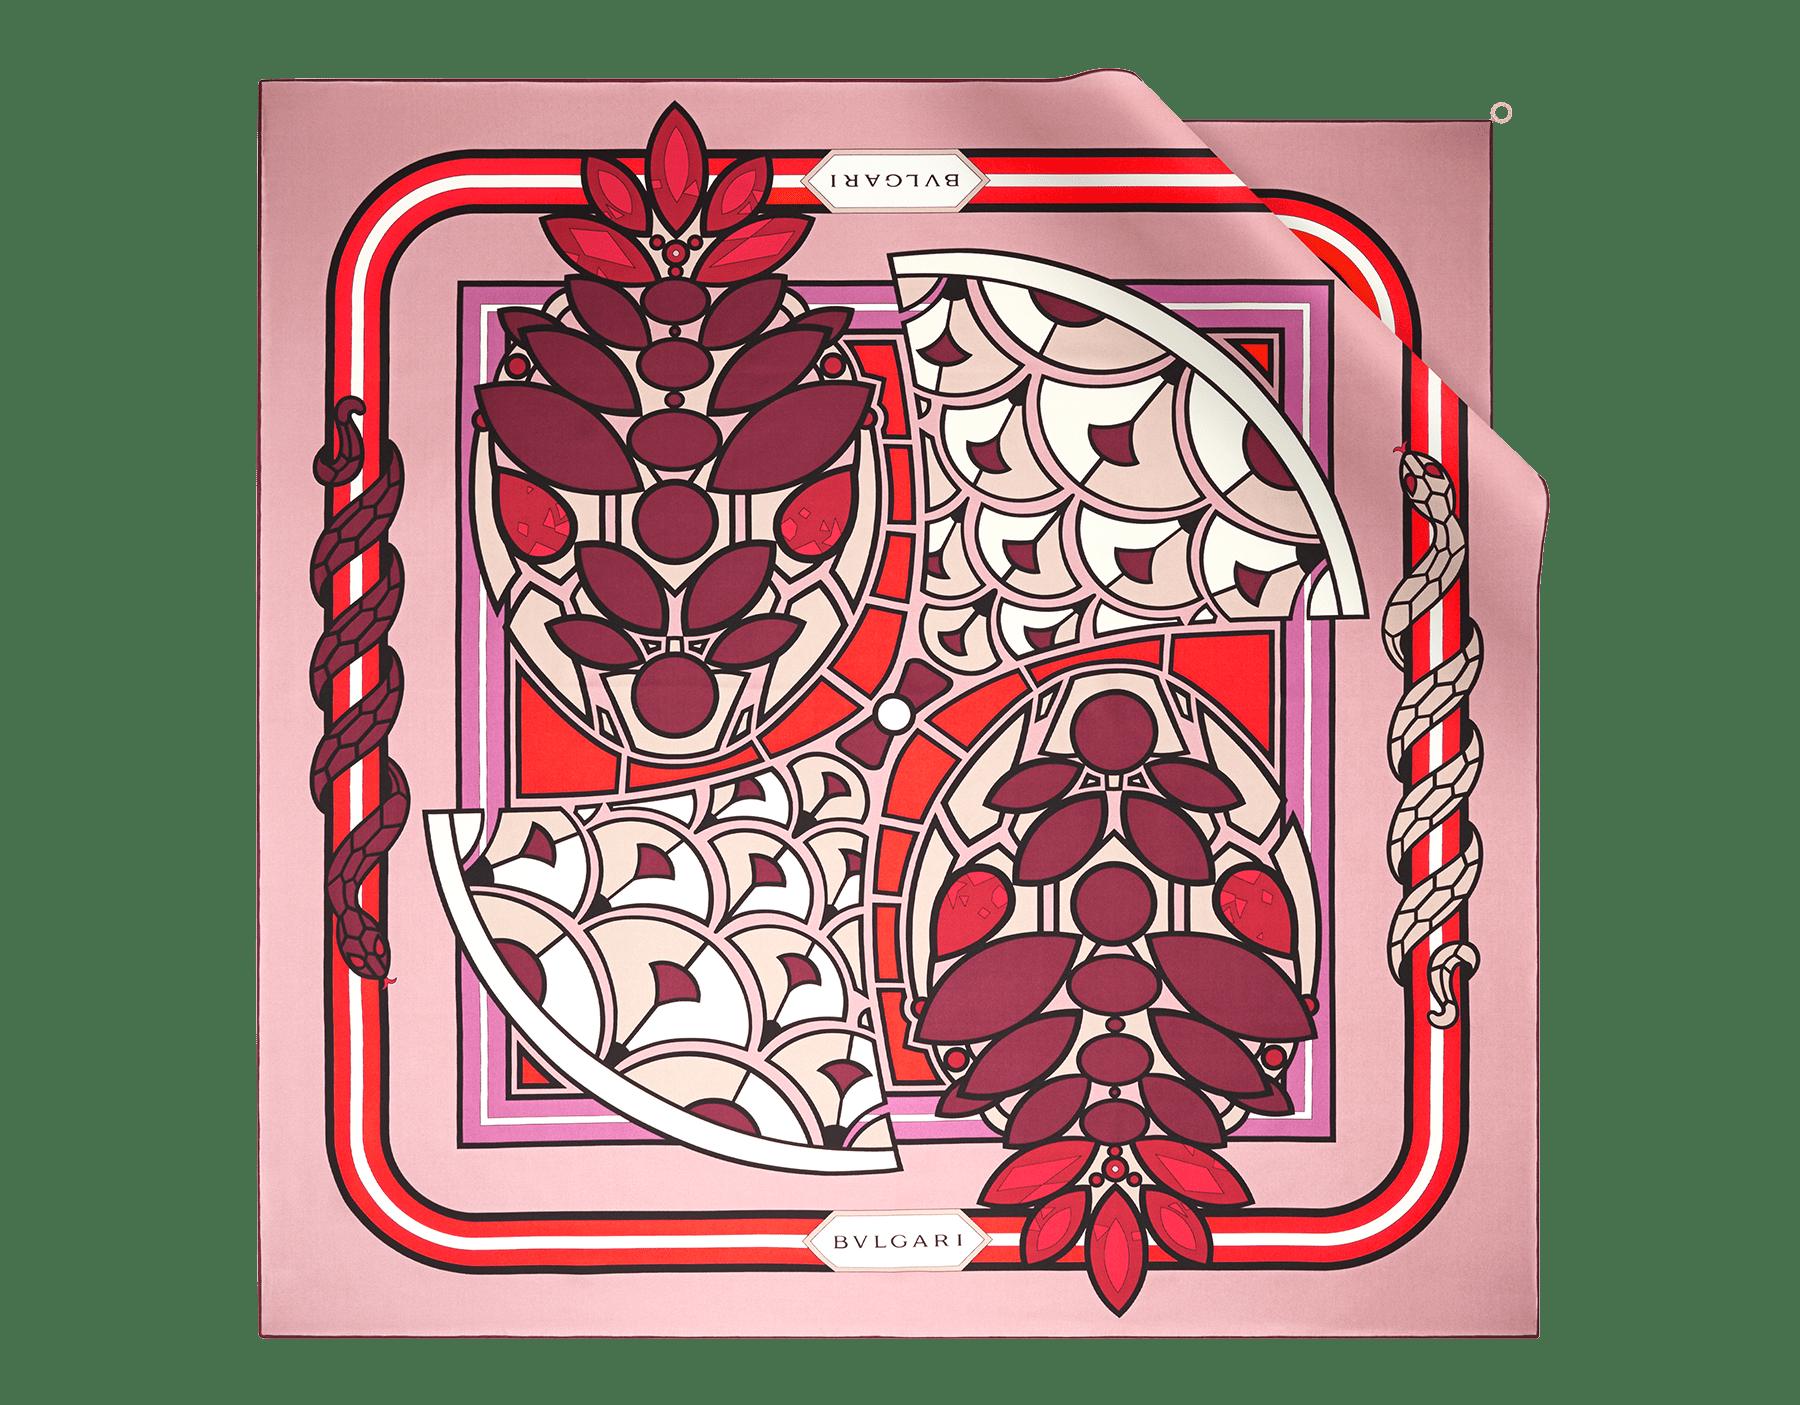 Foulard Enchanted Diva rosa agata in pregiato twill di seta. 243034 image 1